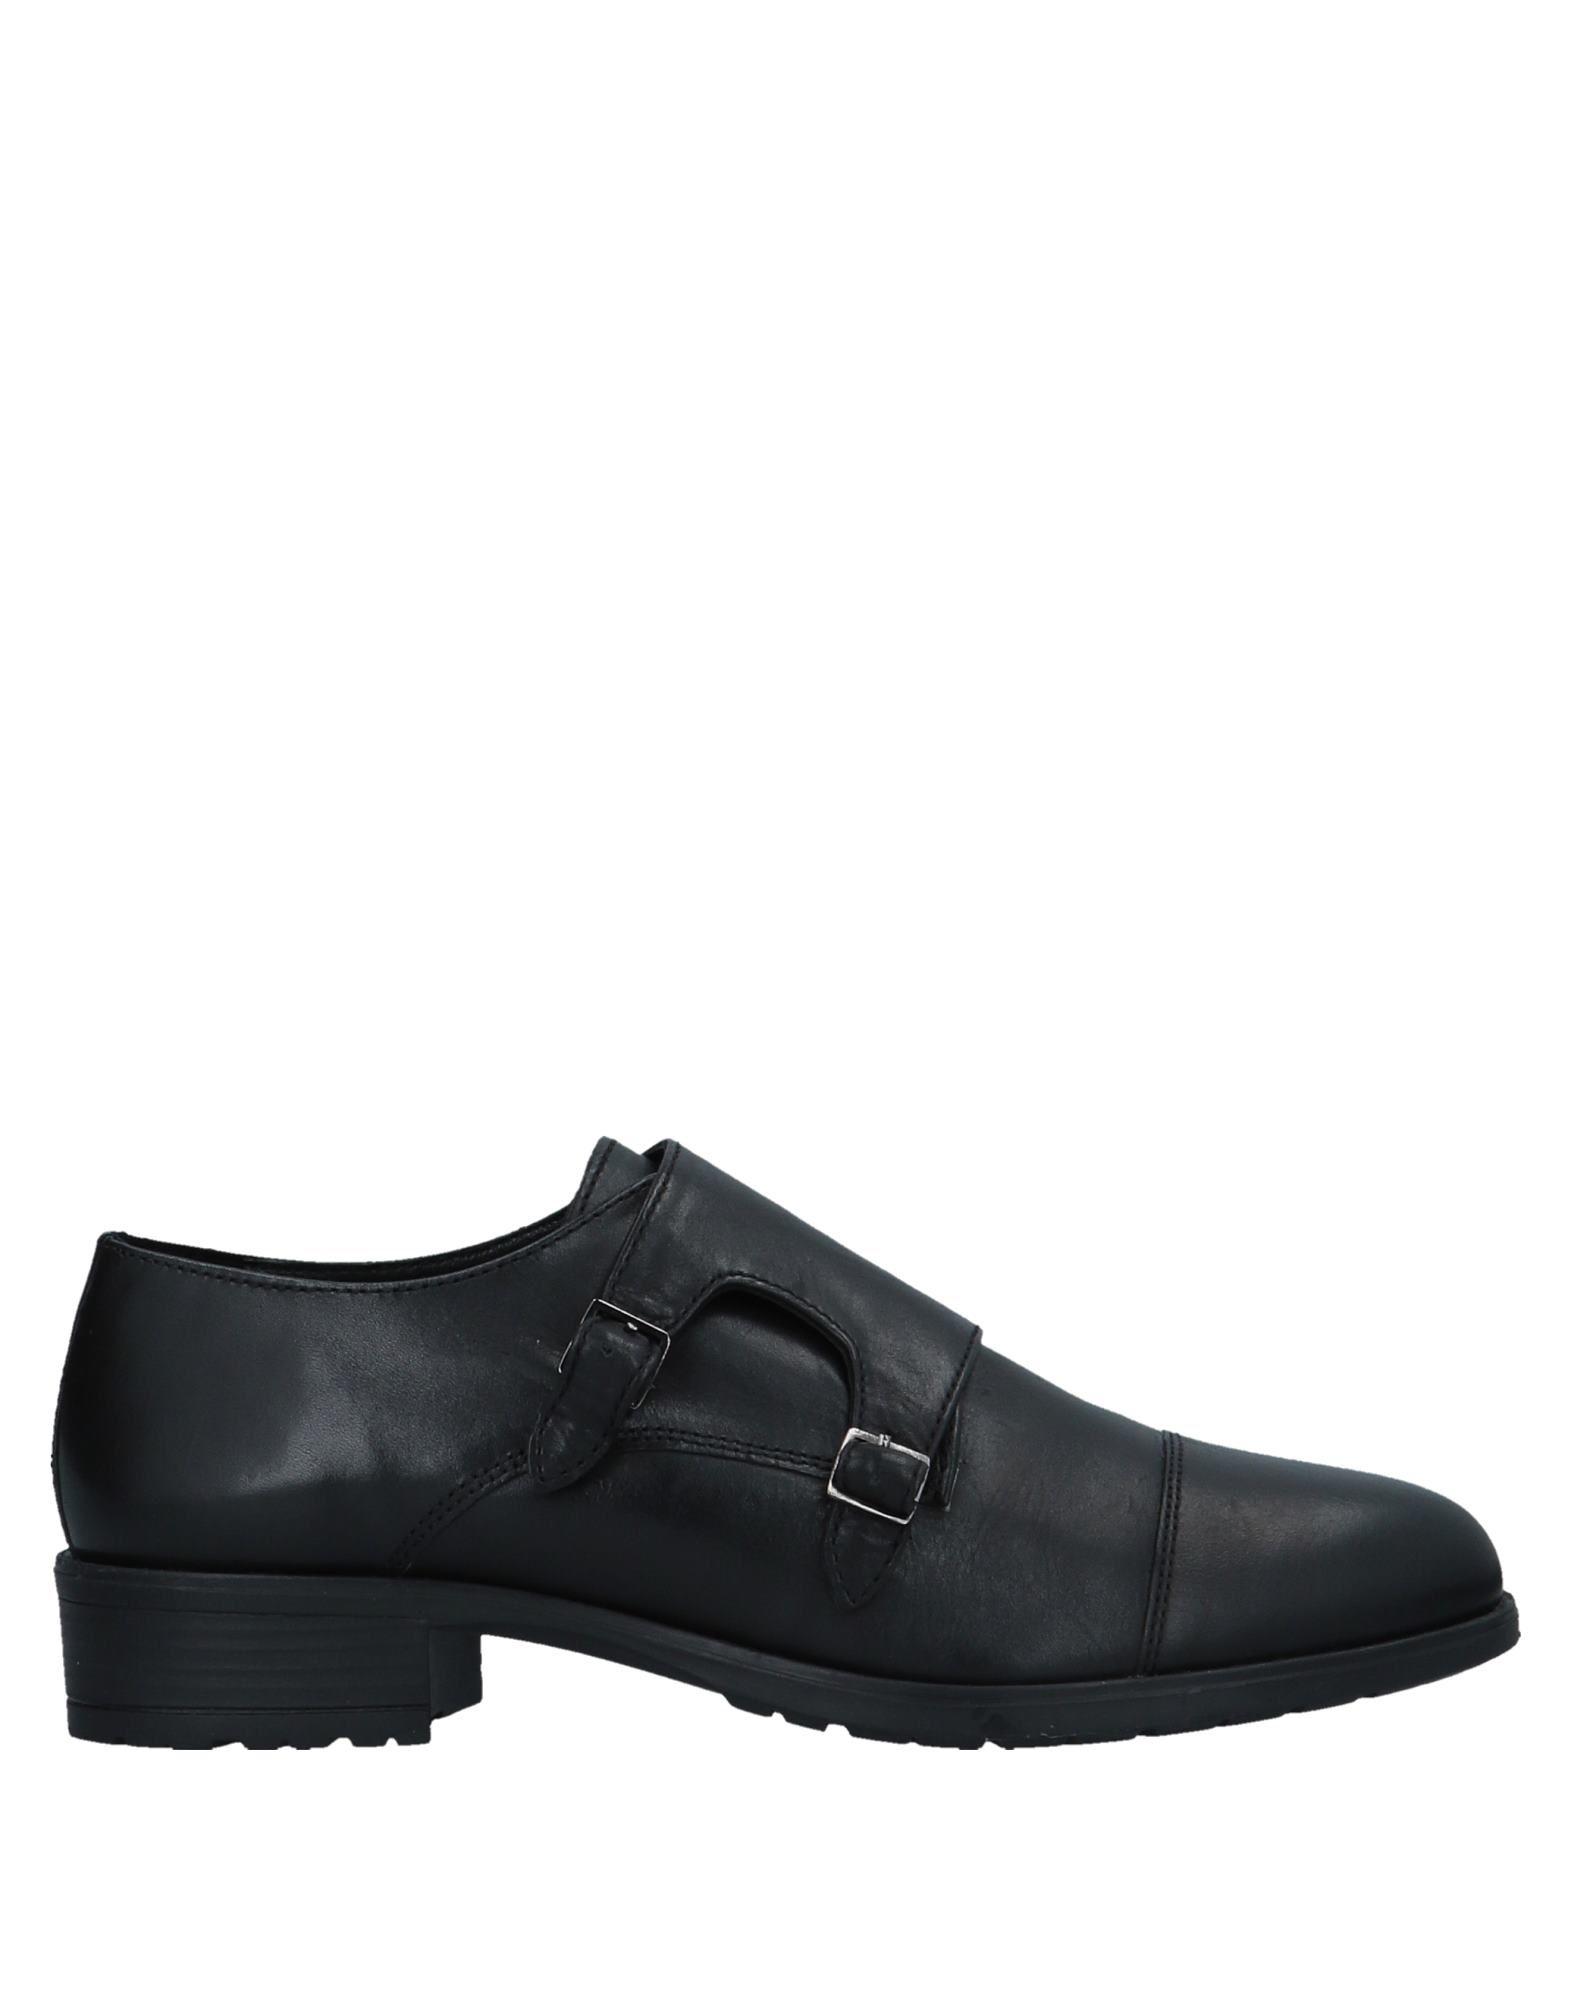 Daniela Mori Milano Mokassins Damen  11544767WC Gute Qualität beliebte Schuhe